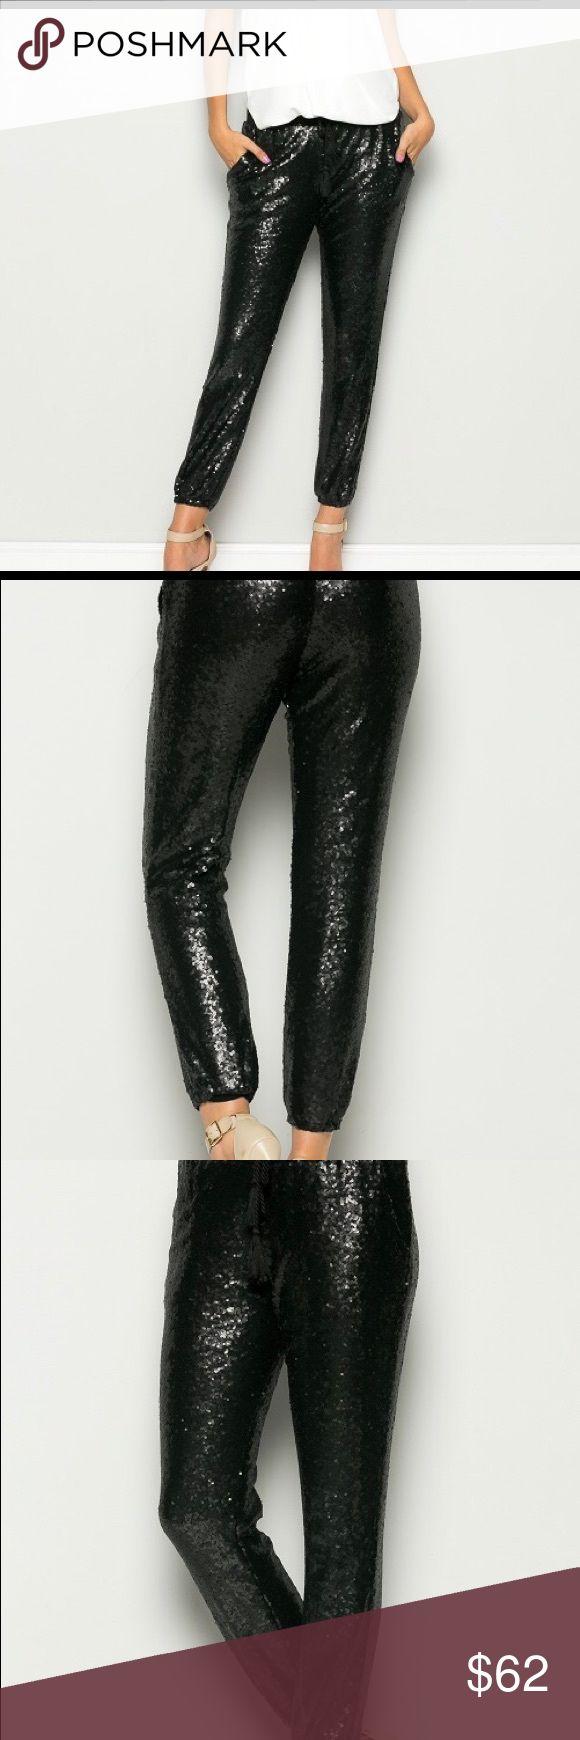 BLACK SEQUIN JOGGER PANTS Drawstring waist black sequin pants, ankle length, drawstring waist. Soft Lining for a comfortable wear💕 boutique Pants Track Pants & Joggers